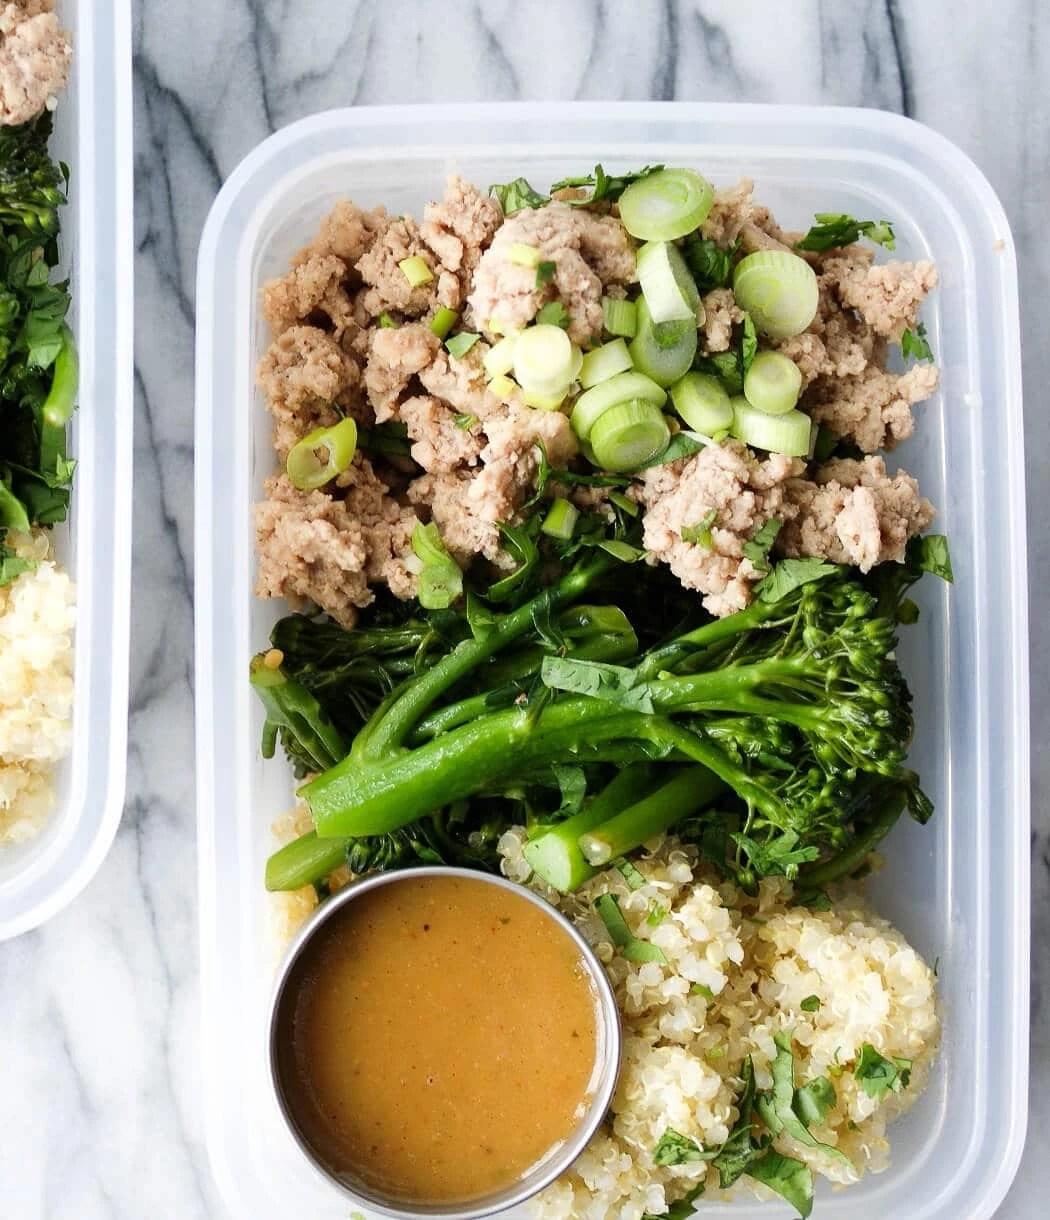 Ground Turkey Meal Prep Bowls Recipe 4 Trader Joes Ingredients